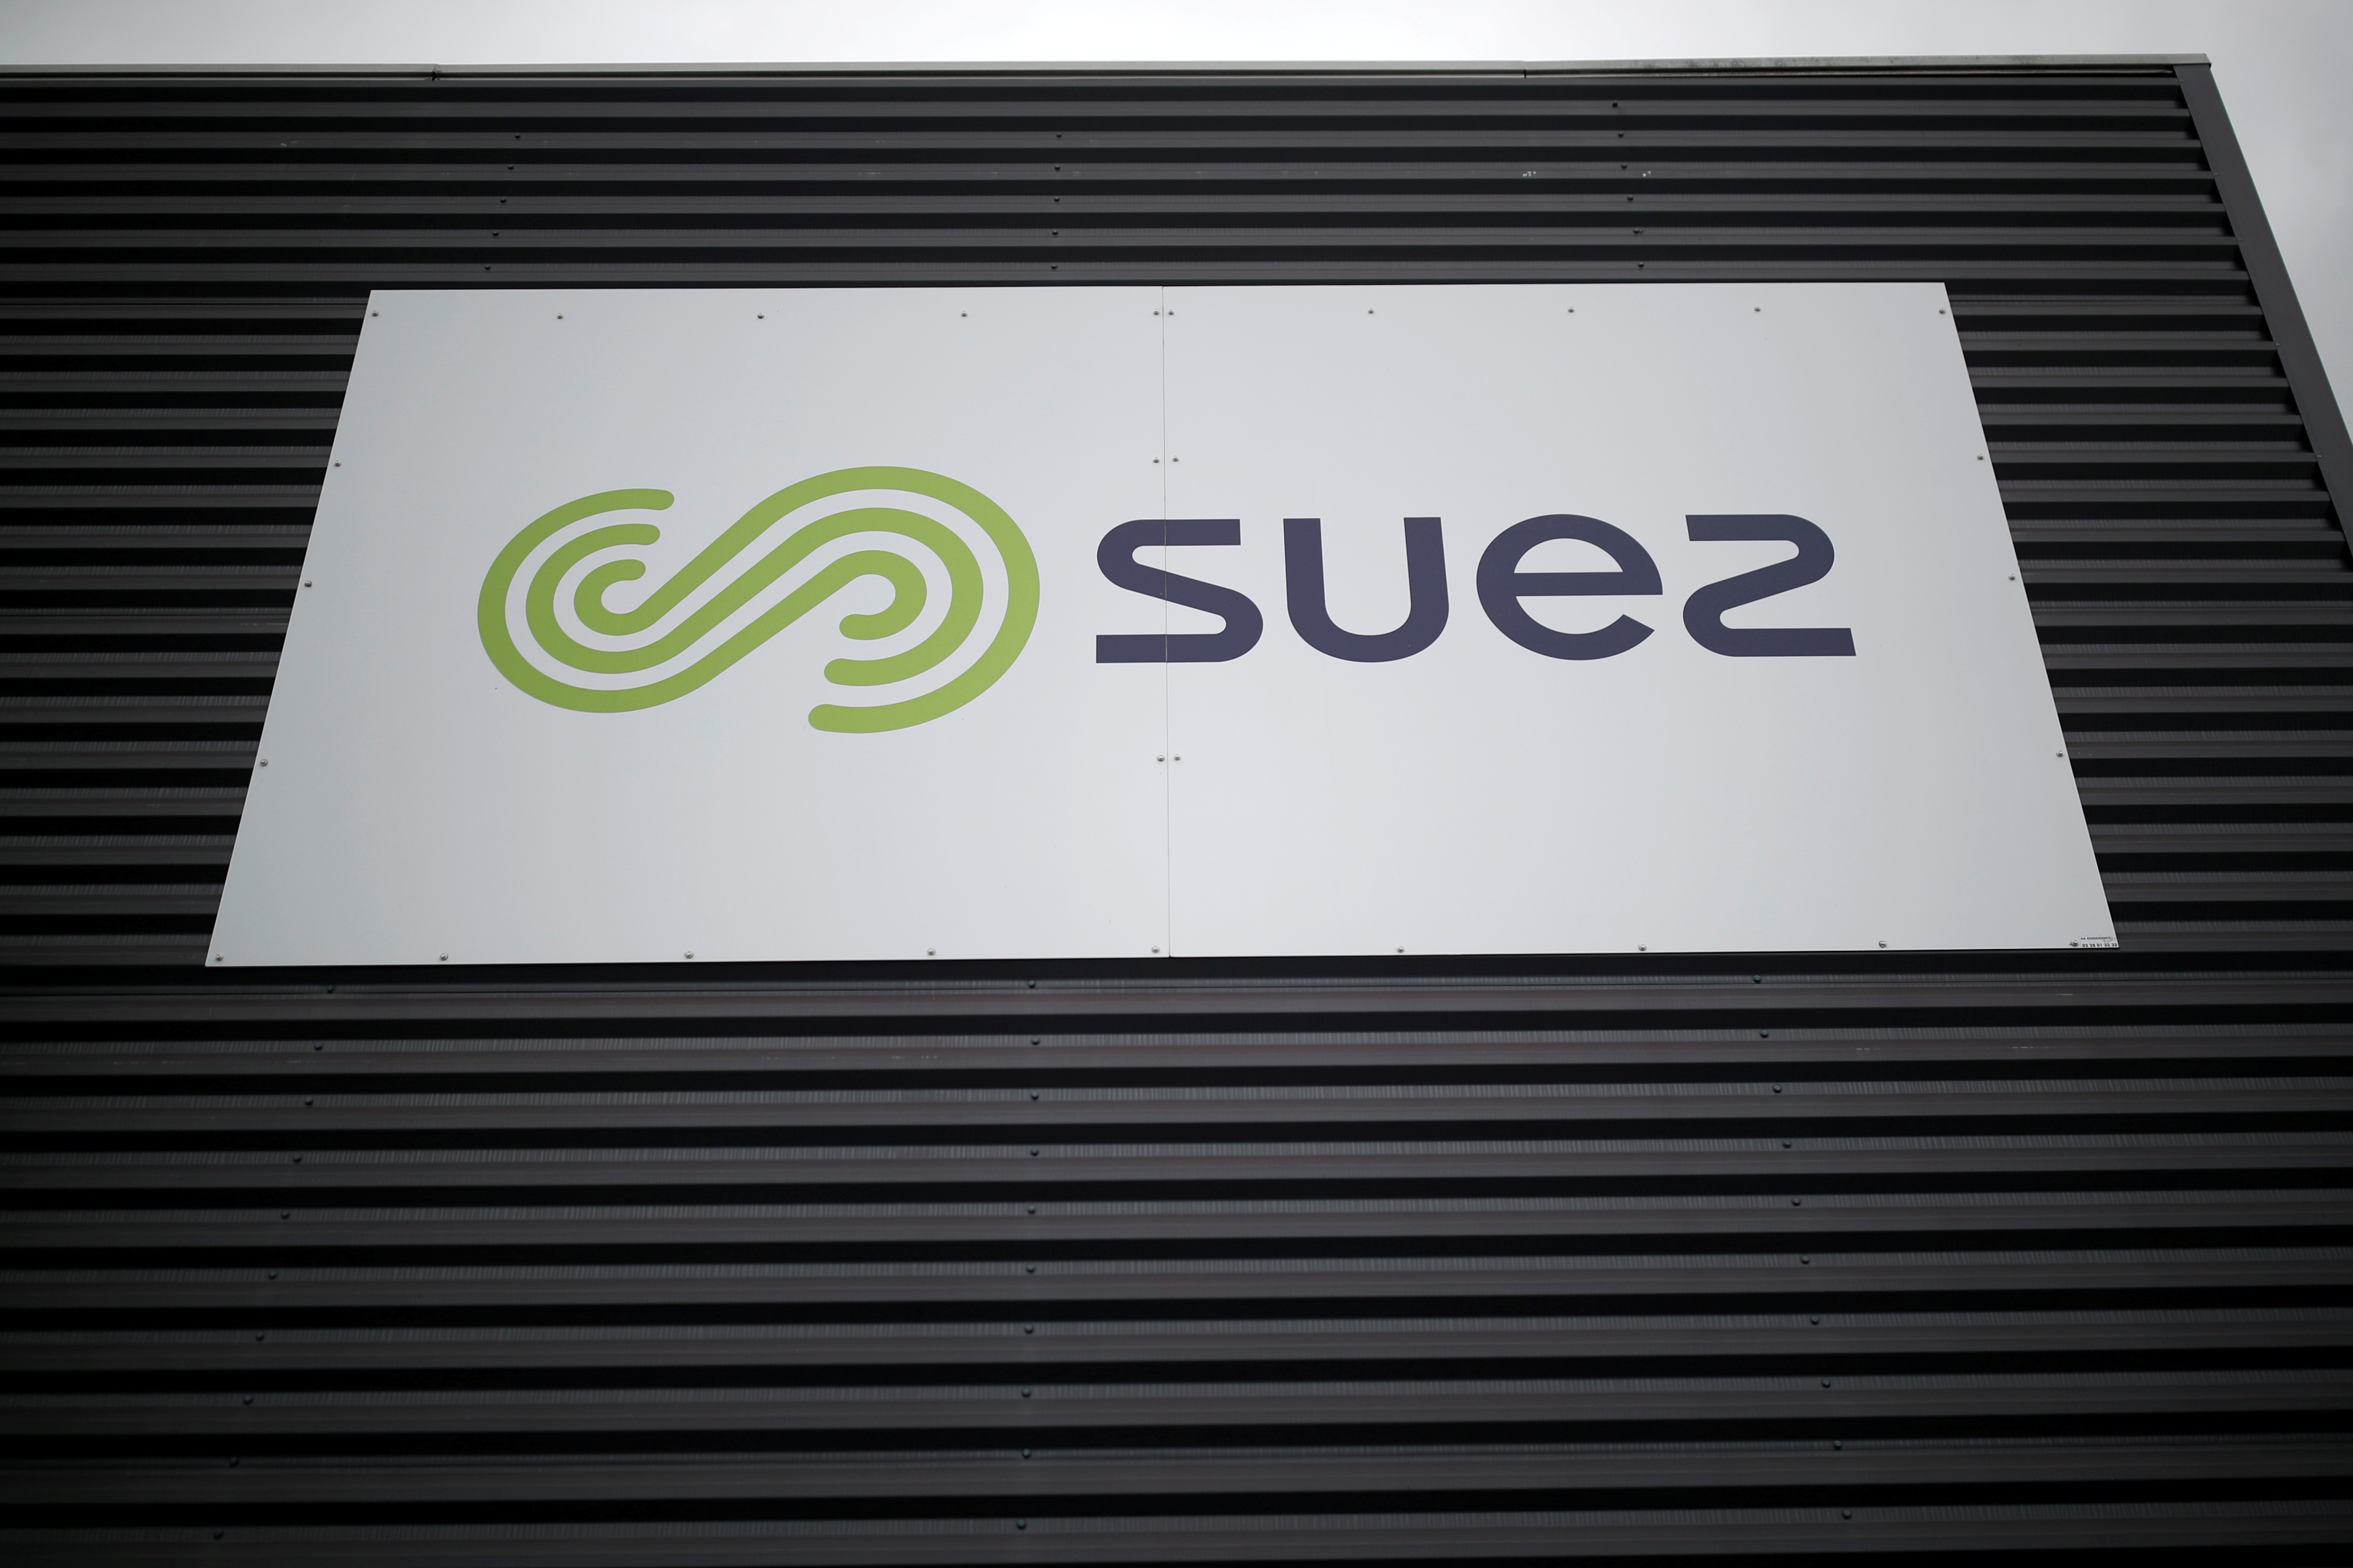 The logo of Suez is seen in La Chapelle-sur-Erdre near Nantes, France, October 5, 2020. REUTERS/Stephane Mahe